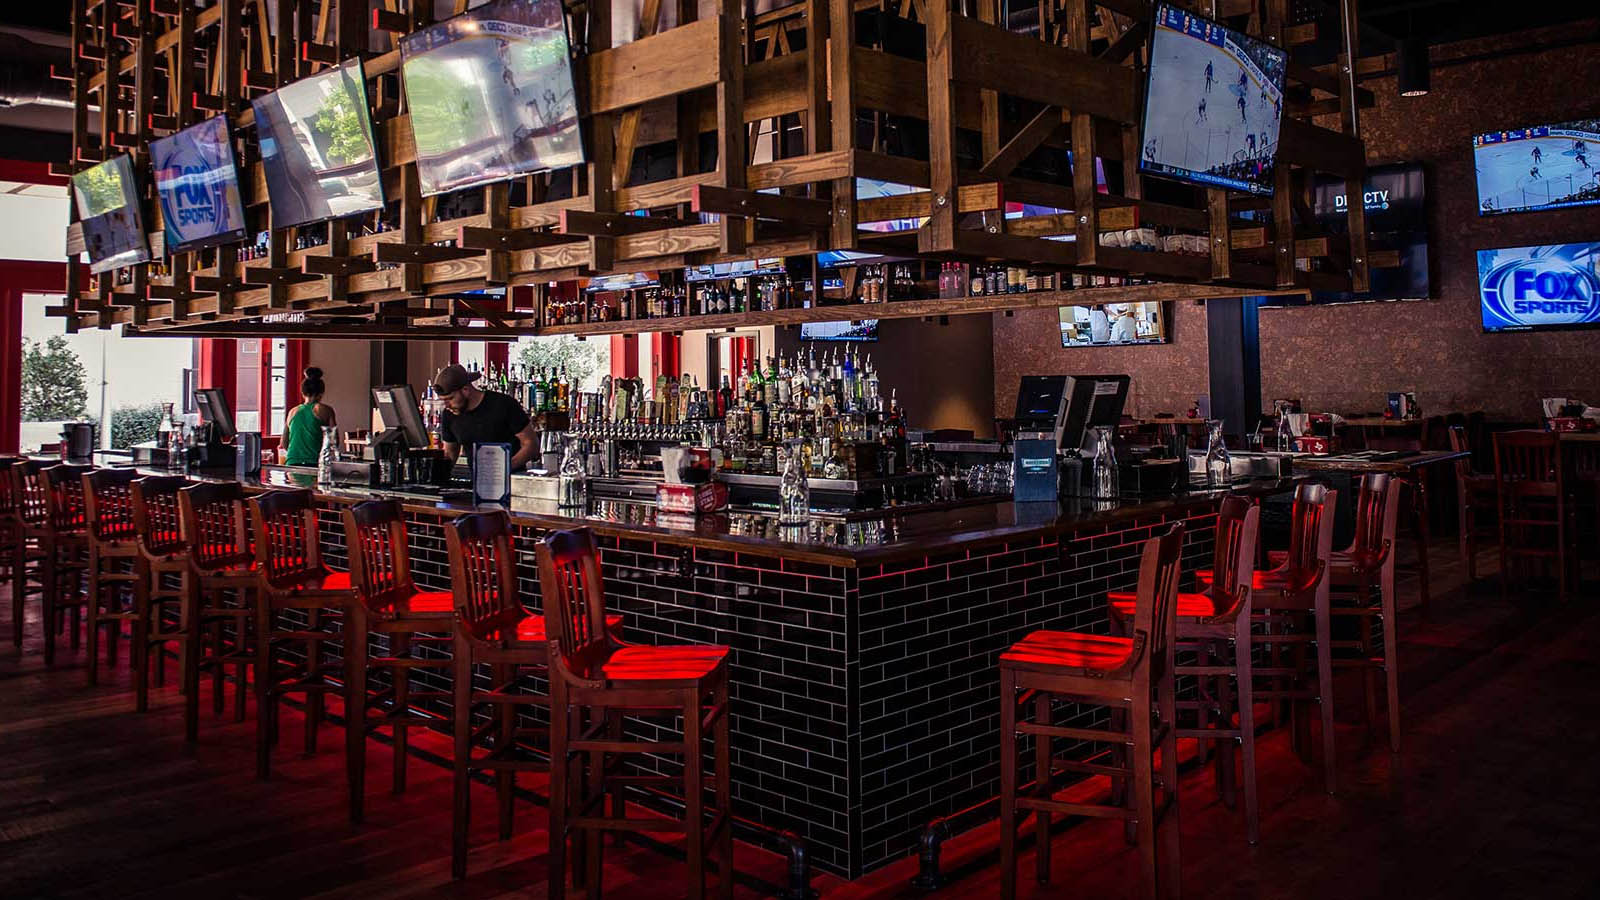 Image of Lavaca Street Bar